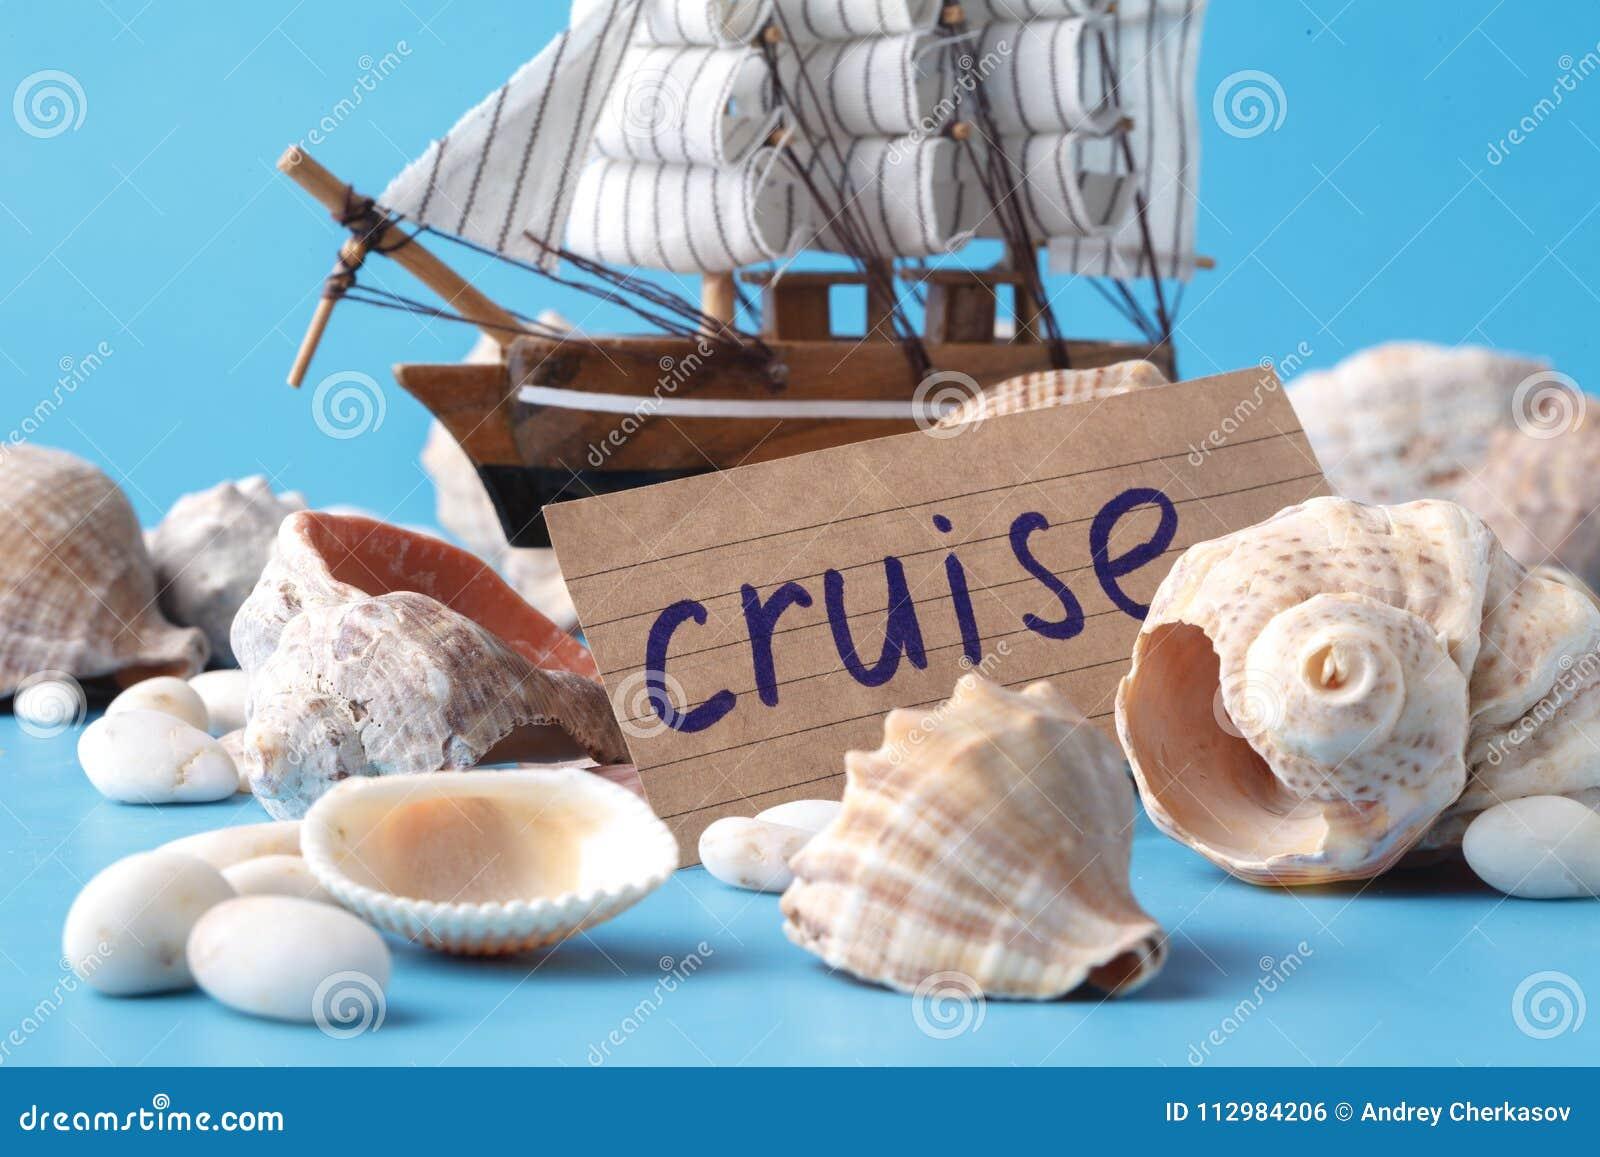 Travel cruise concept, vacation dreams